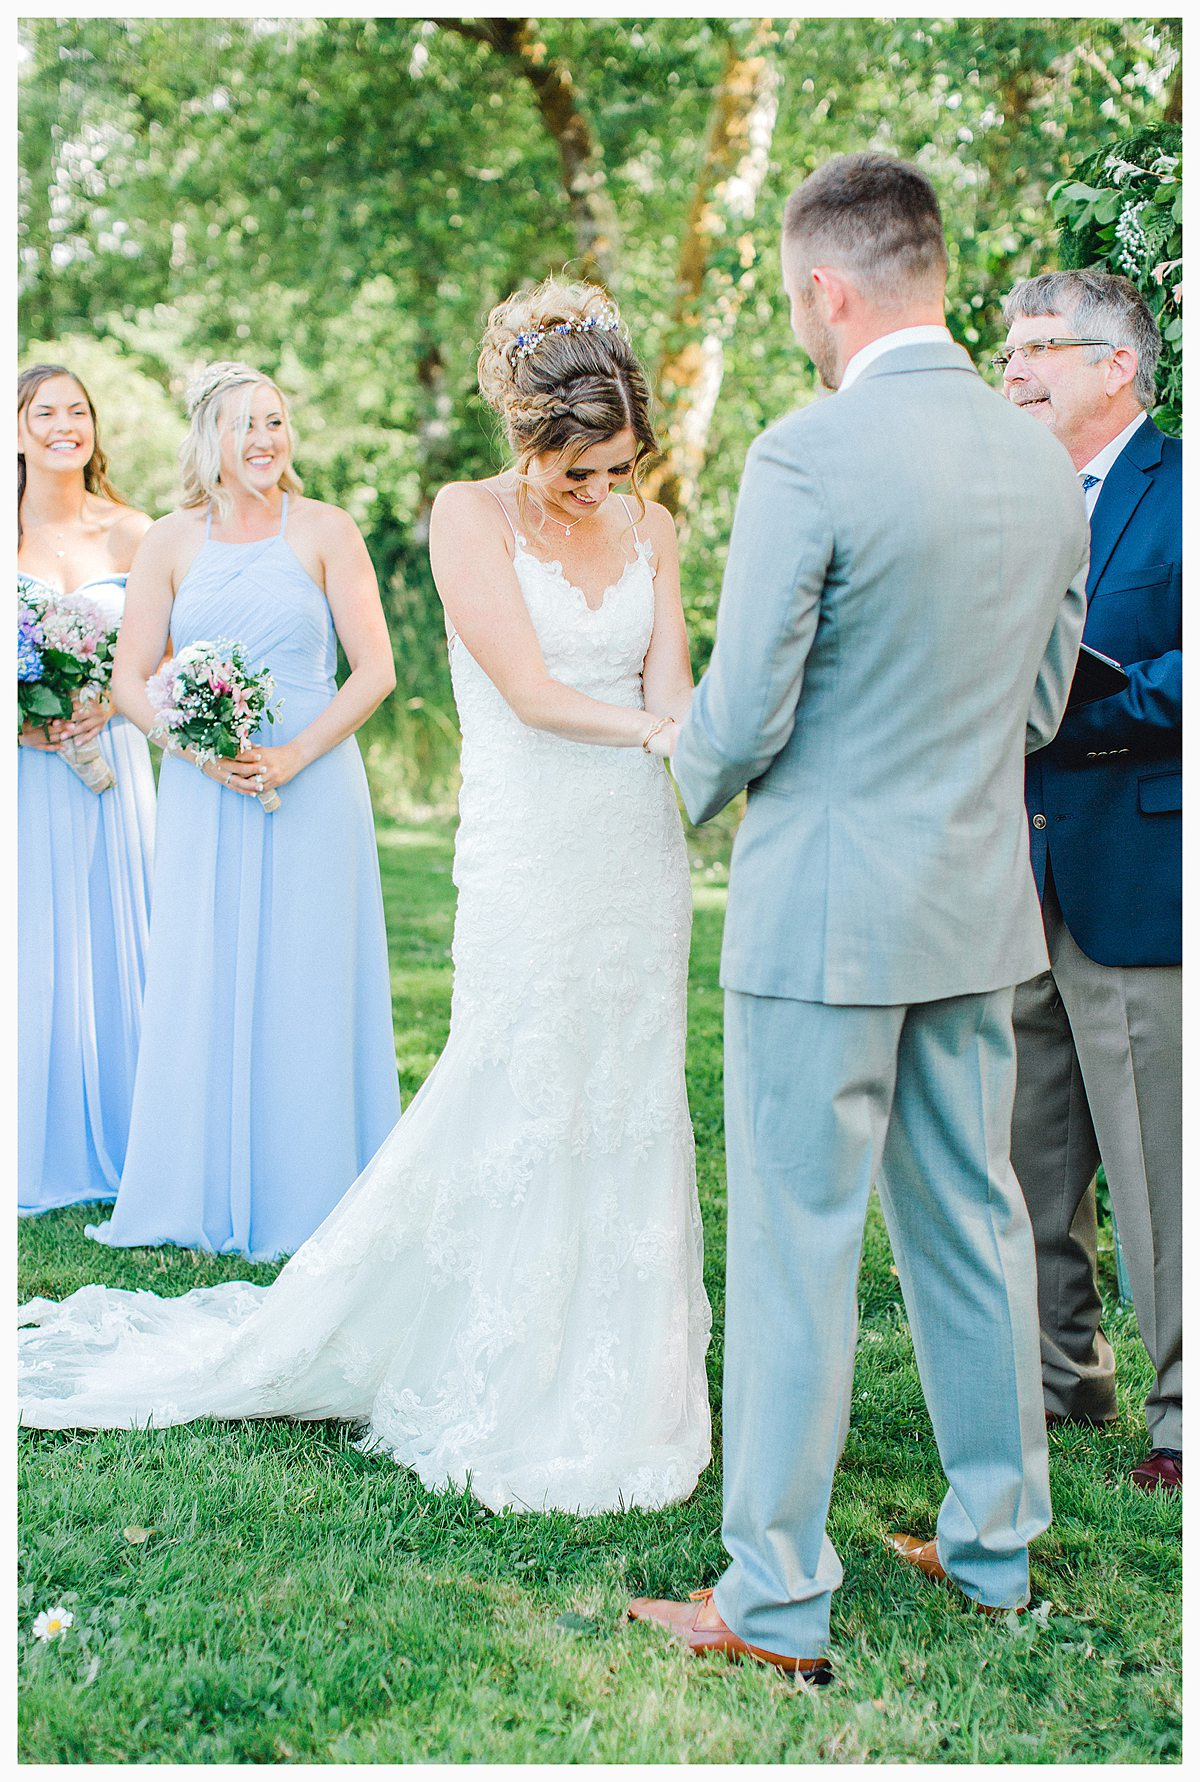 Rustic Coastal Blue Wedding in Southwest Washington, Emma Rose Company, Seattle and Portland Wedding Photographer, Light and Airy_0123.jpg